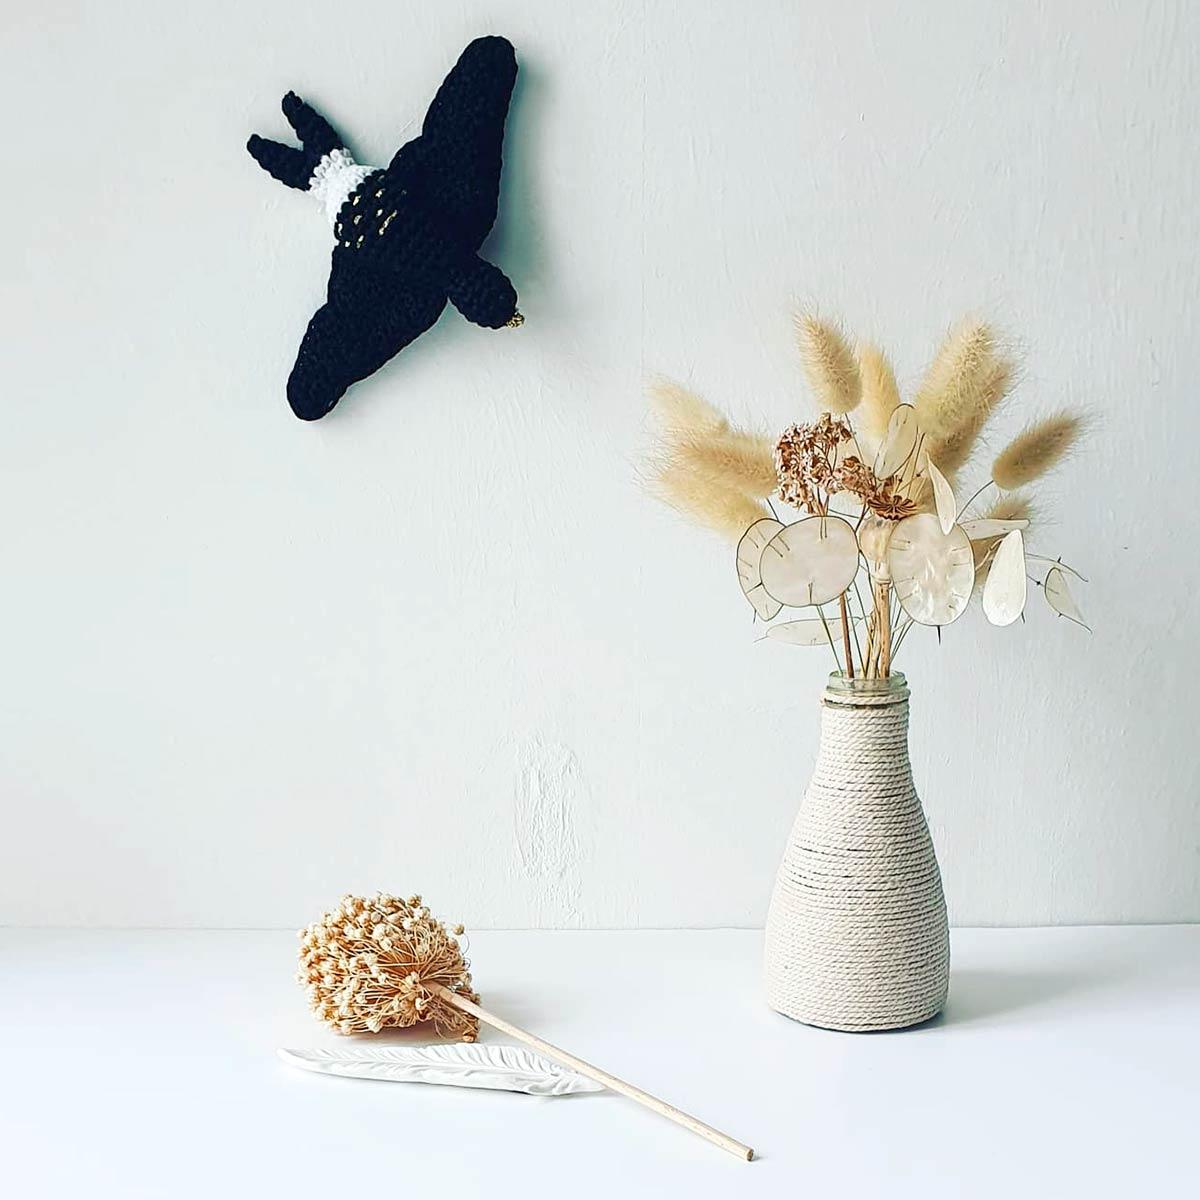 hirondelle-crochet-amigurumi-mafabriquebykaro-diymelimelo